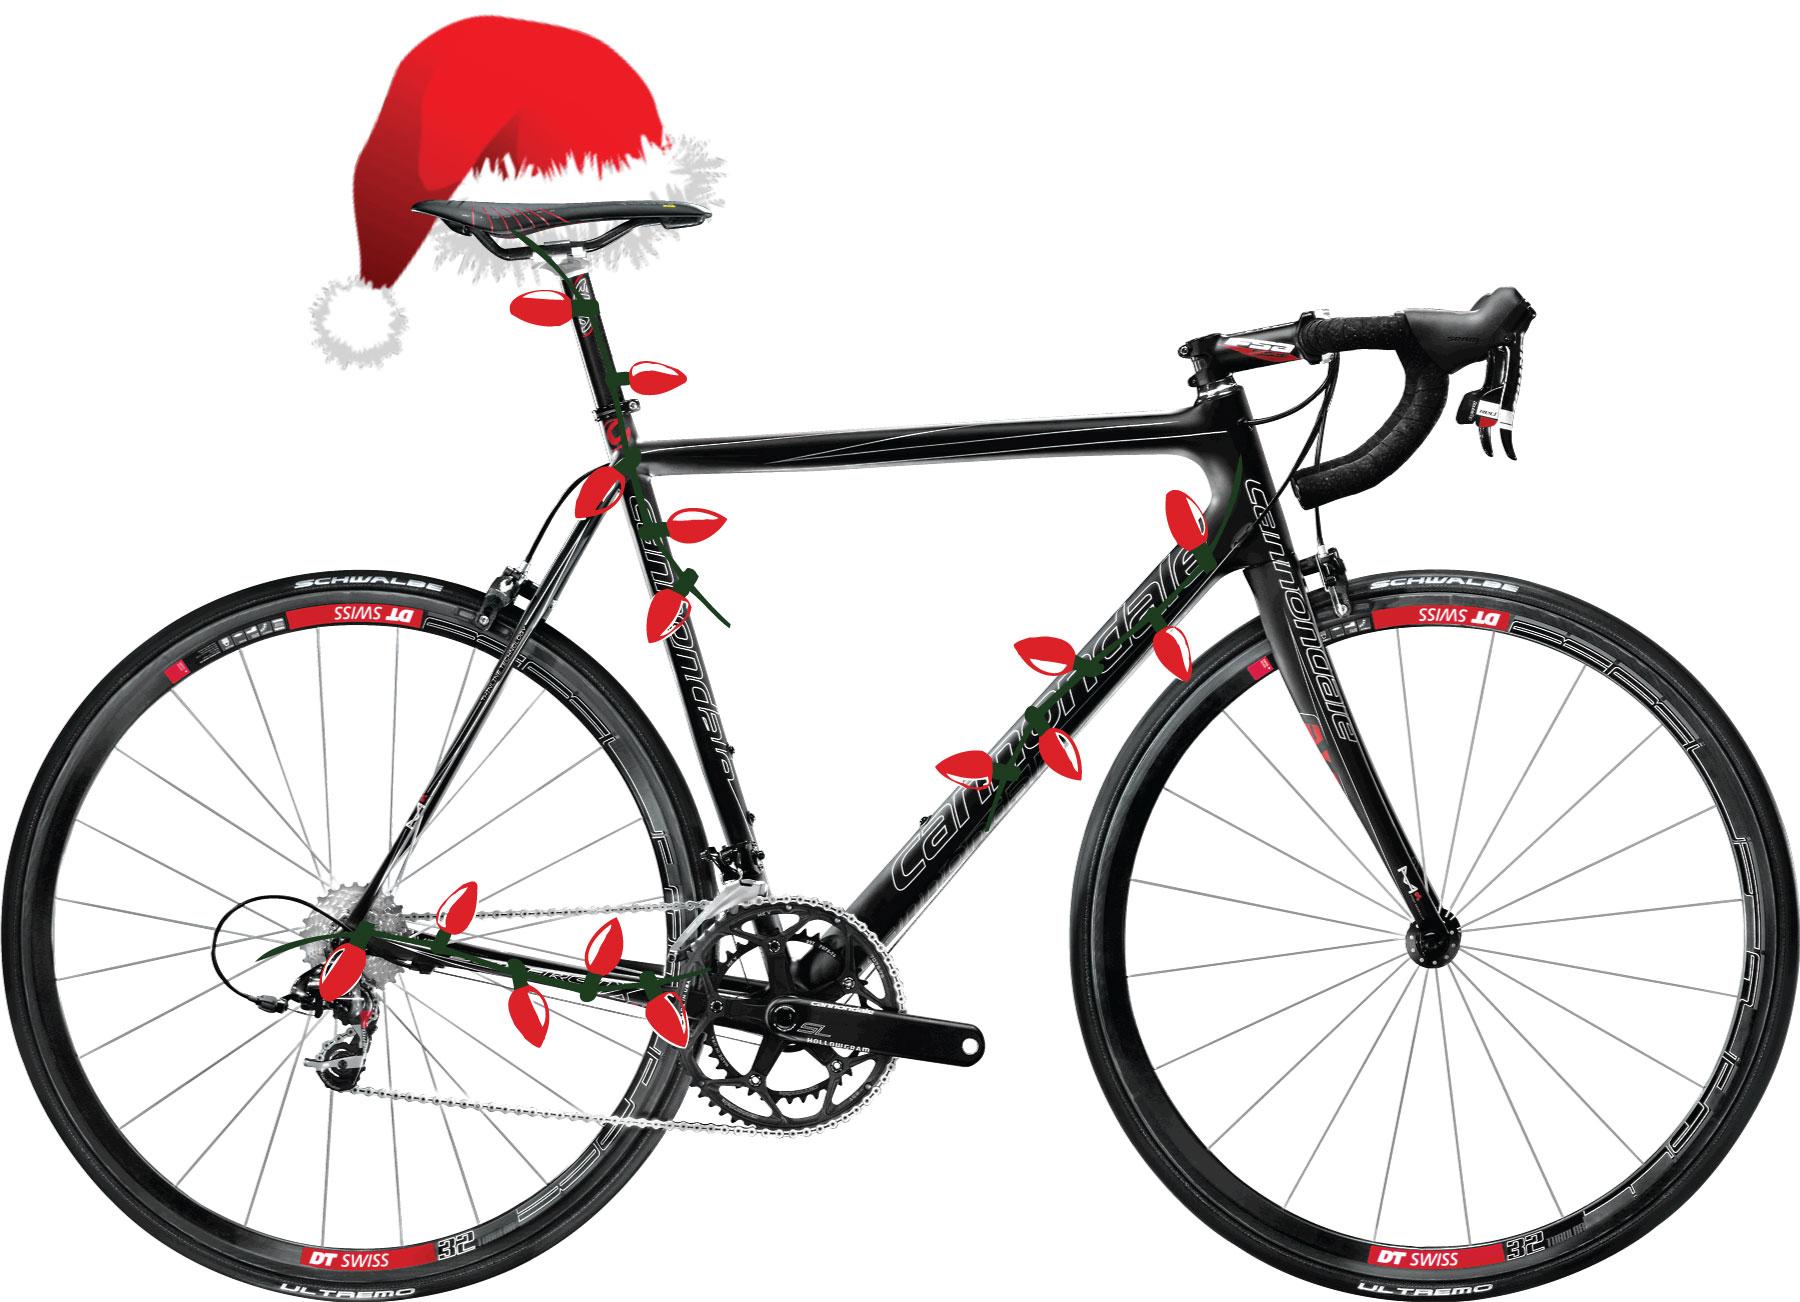 Christmas Bike Sale 2011 | Infinite Cycles Bike Shop